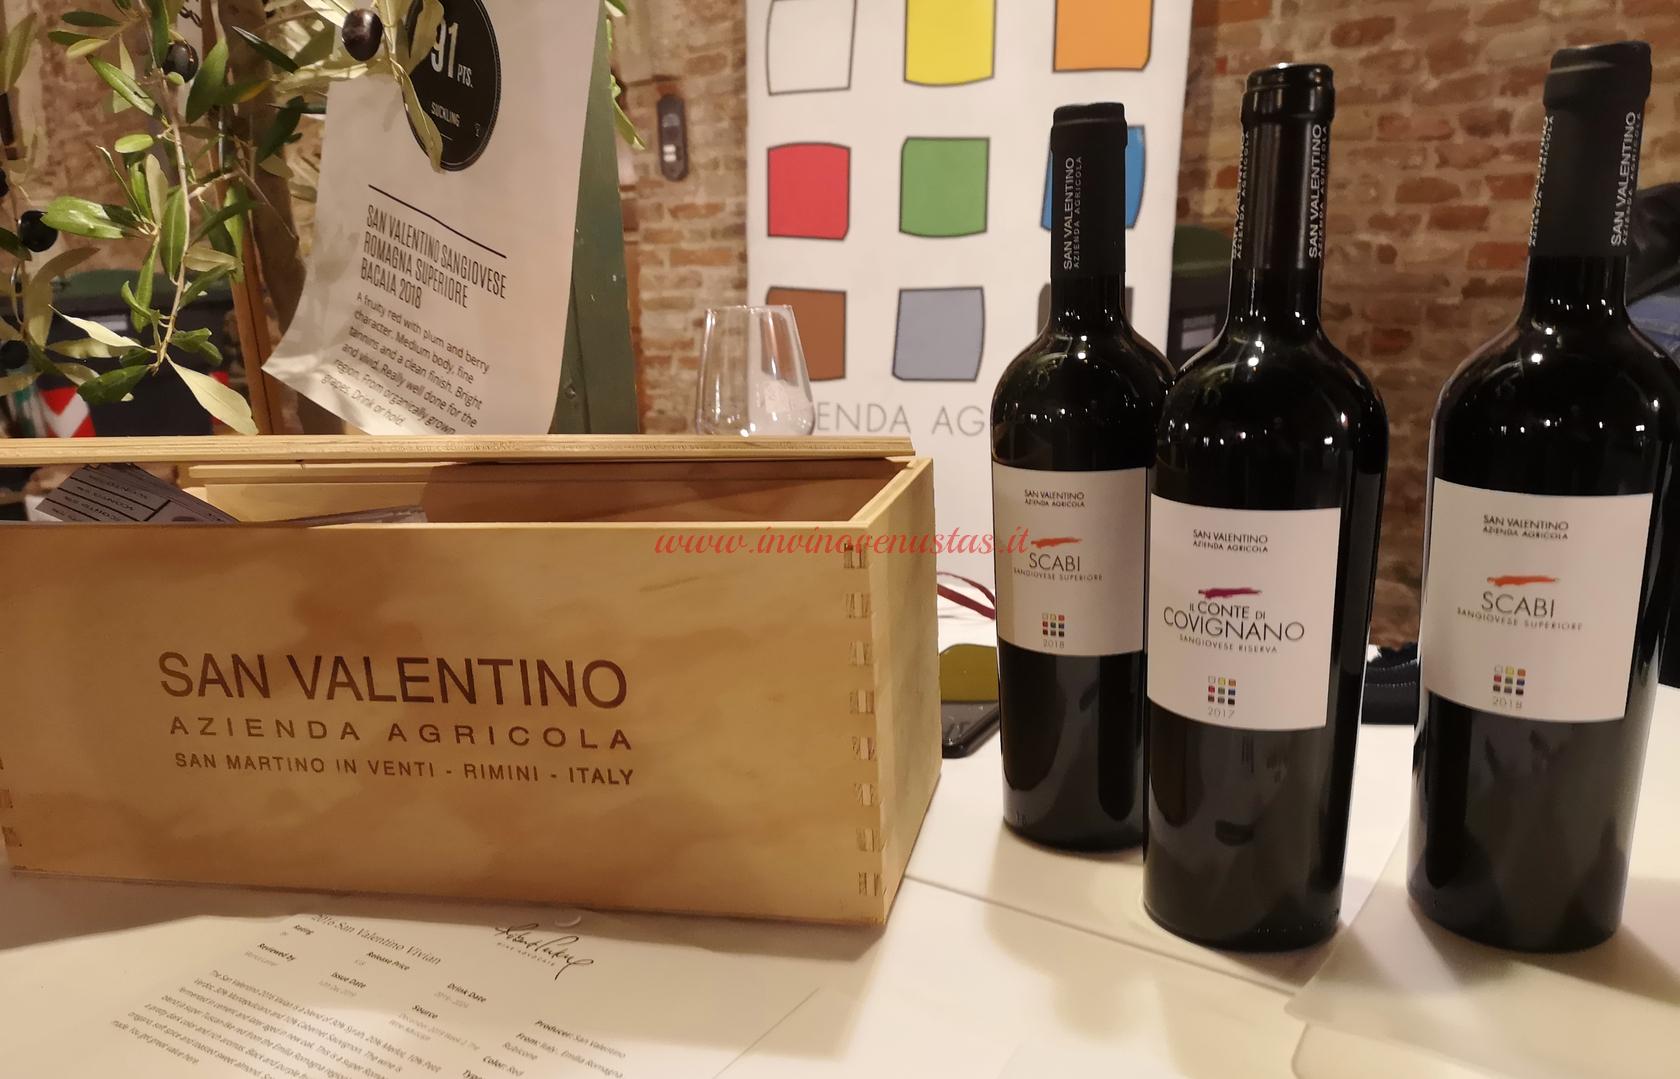 Vini San Valentino p.assaggi di vino